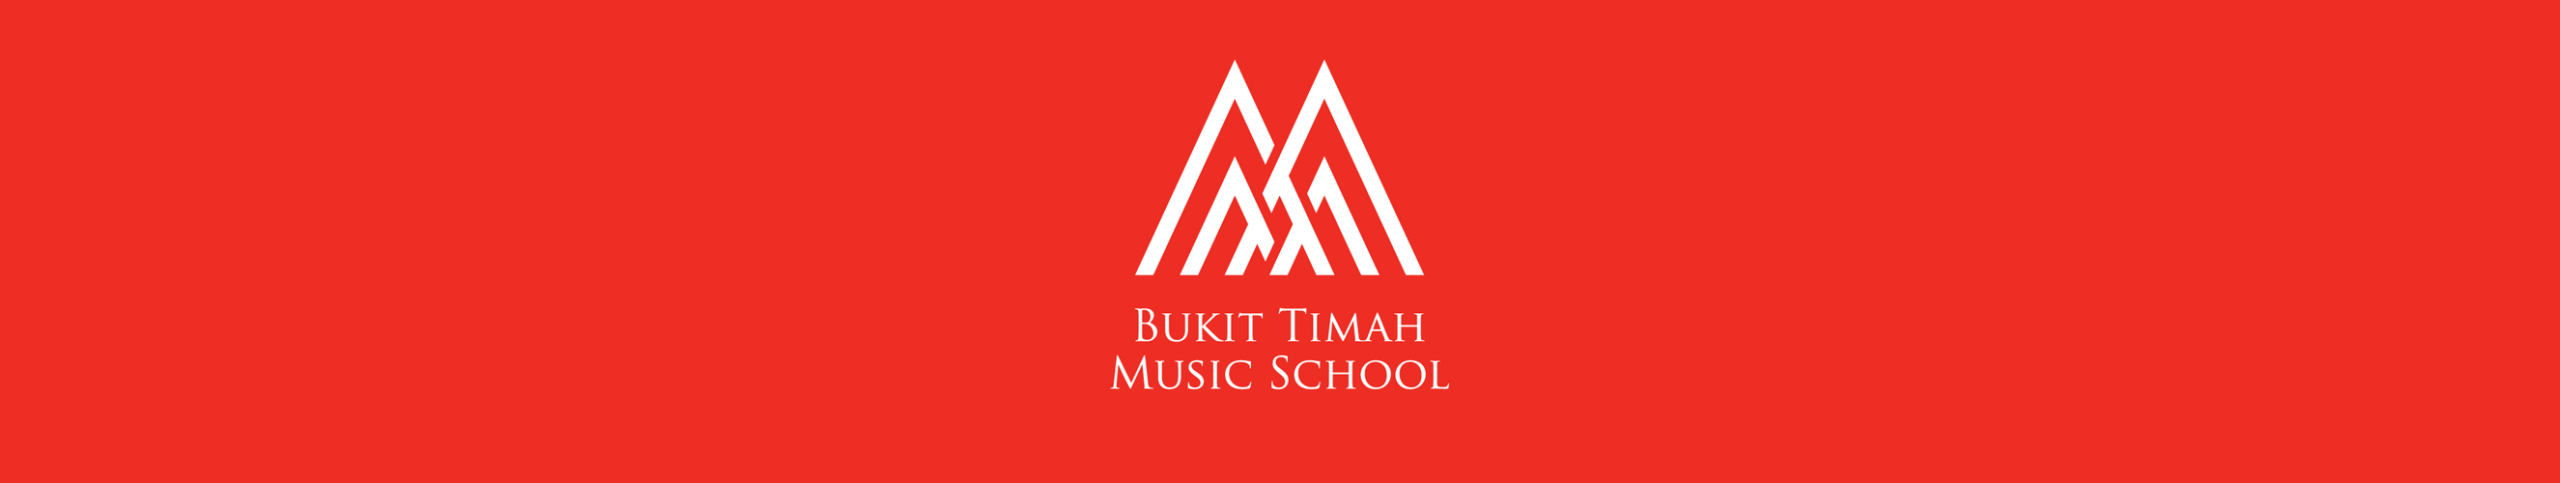 Bukit Timah Music School - Small Logo